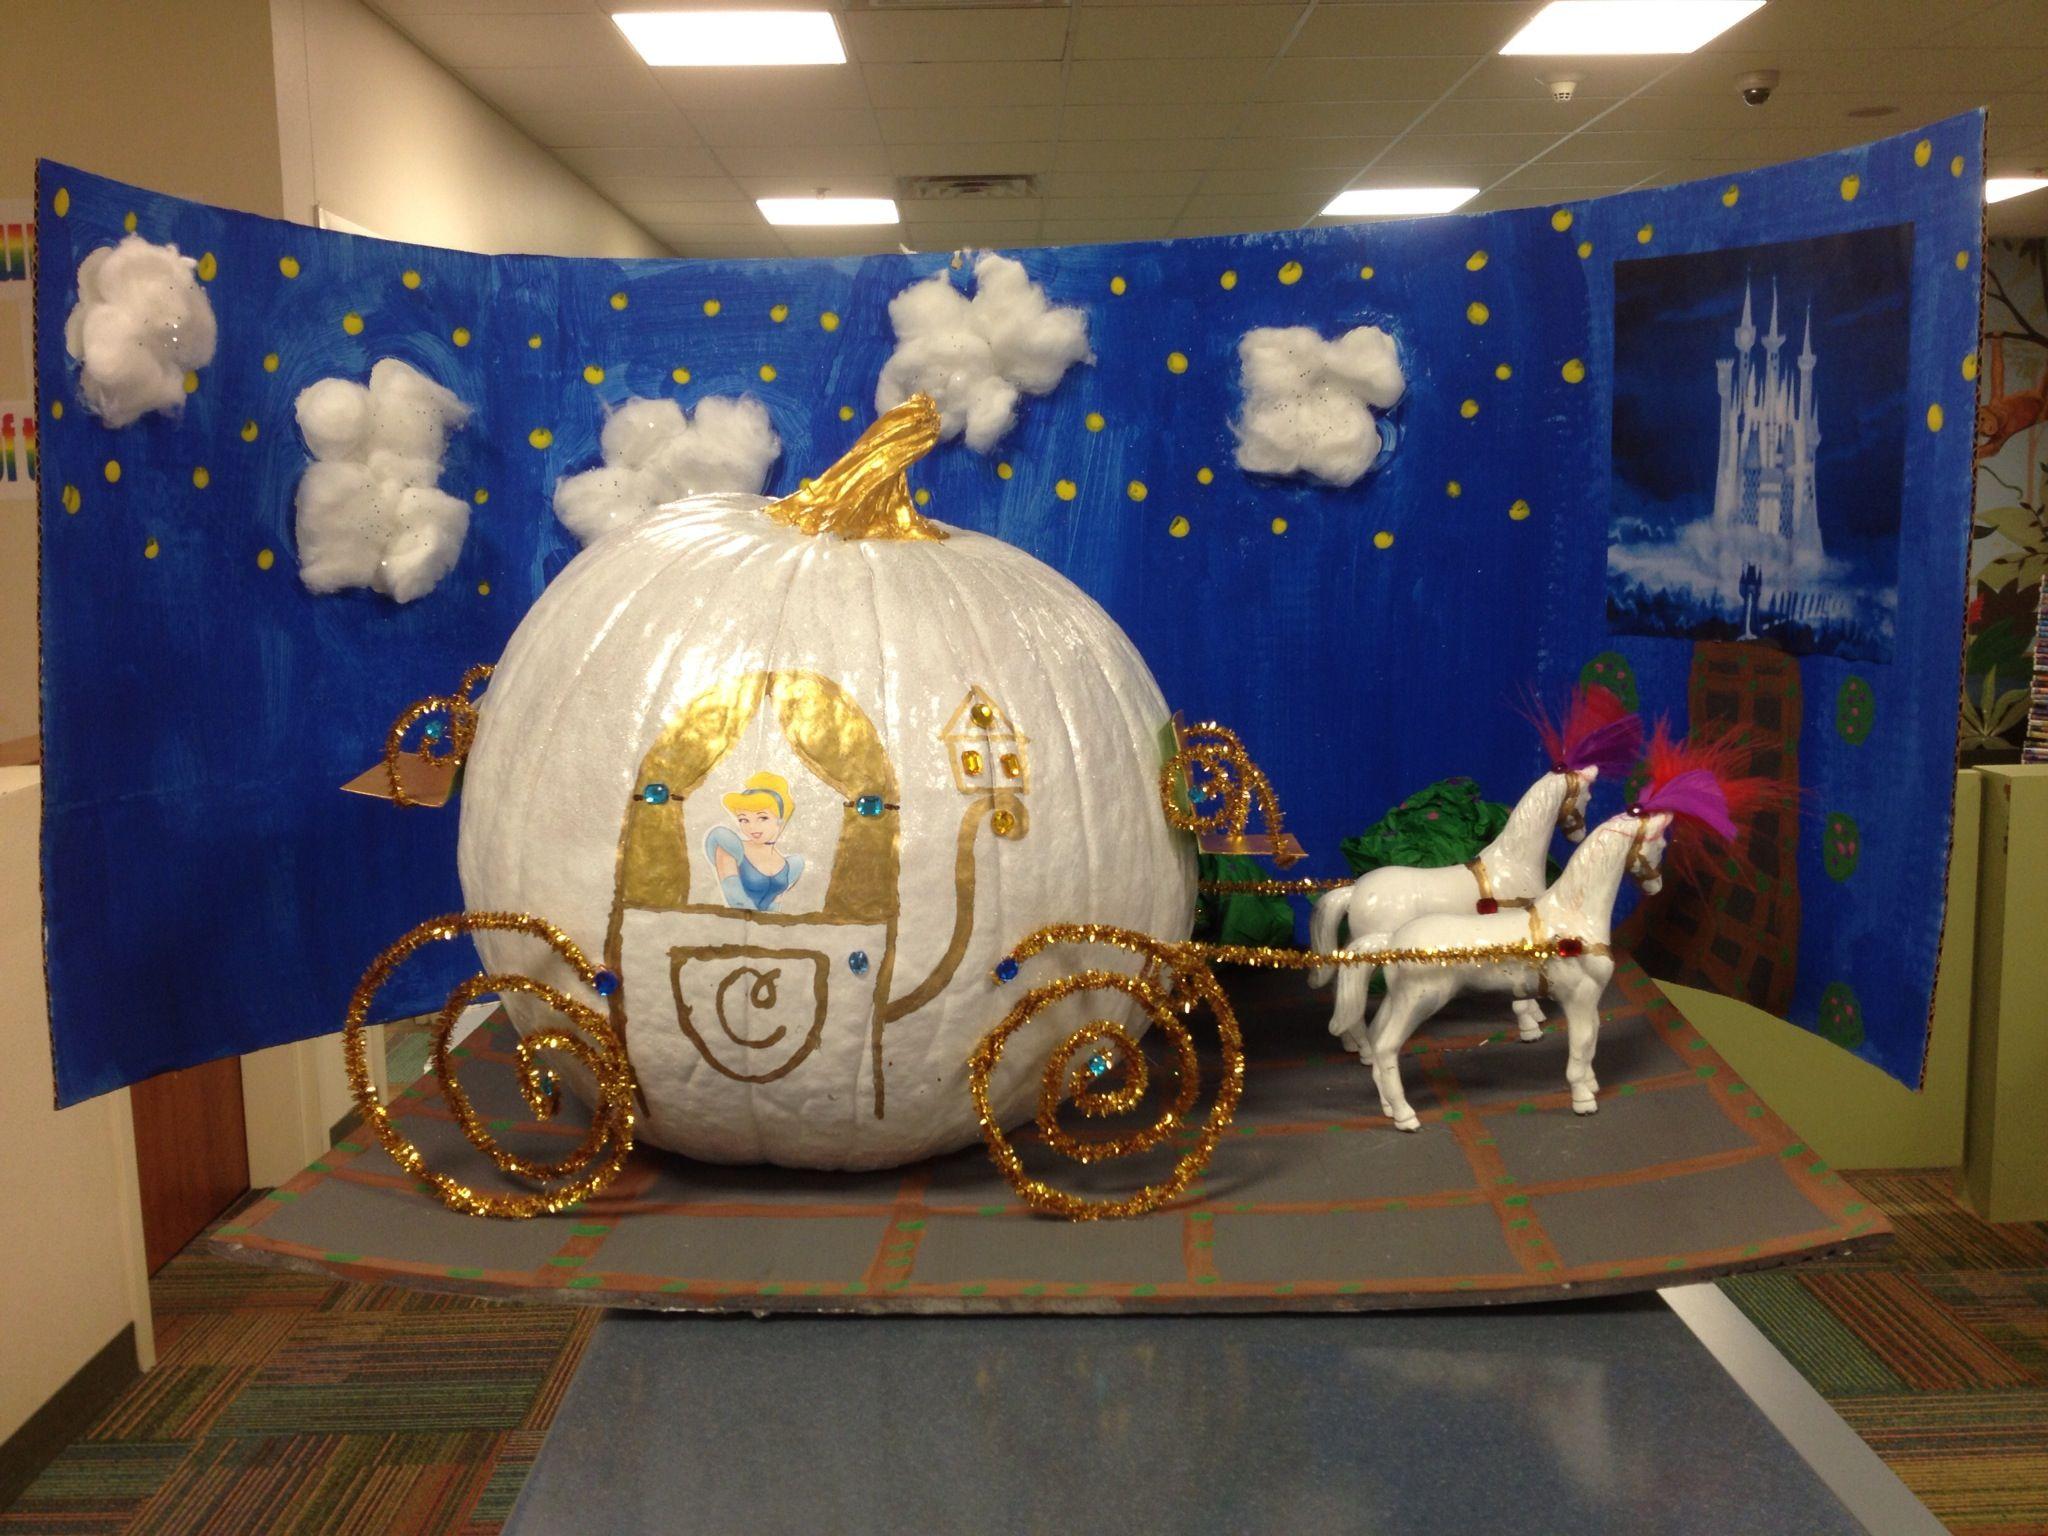 Cinderella S Carriage For Pumpkin Decorating Contest Pumpkin Halloween Decorations Pumpkin Decorating Contest Cinderella Pumpkin